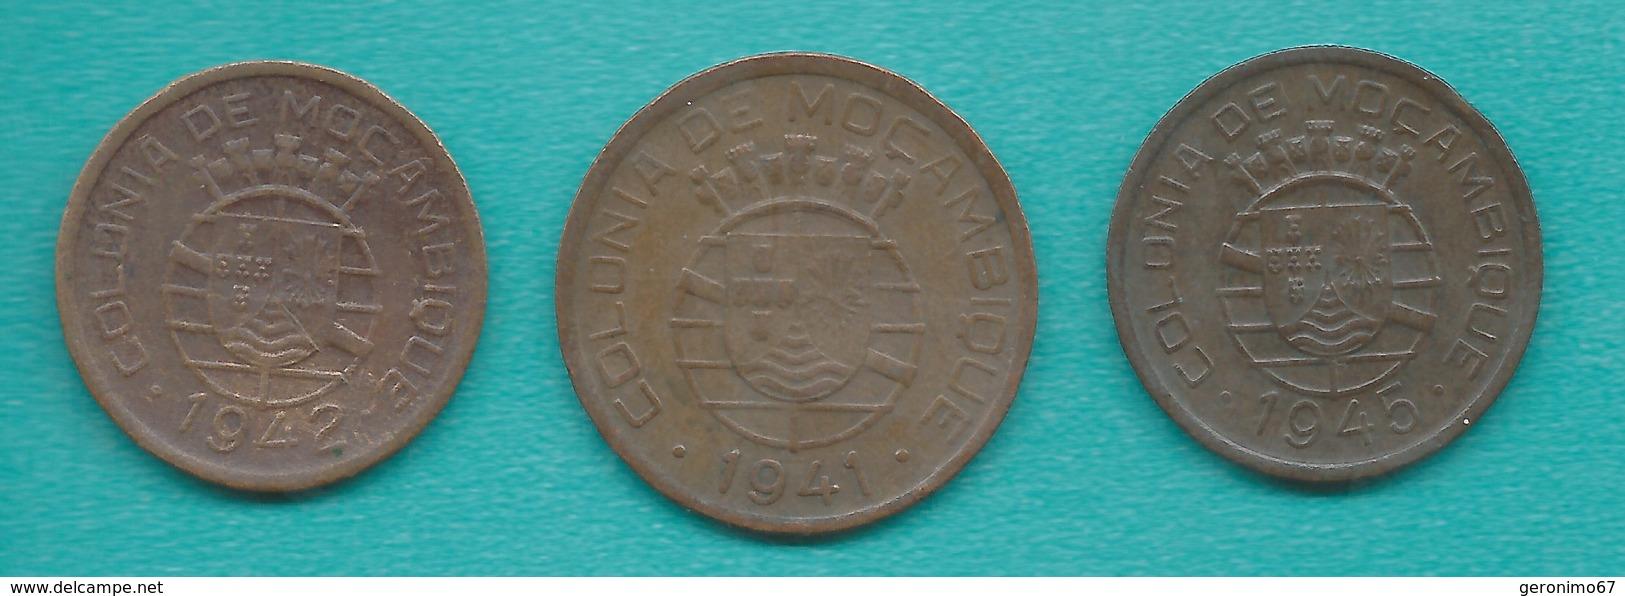 Mozambique - Portuguese Colony -  10 - 1942 (KM72); 20 - 1941 (KM71) & 50 Centavos (1945) KM73 - Mozambique